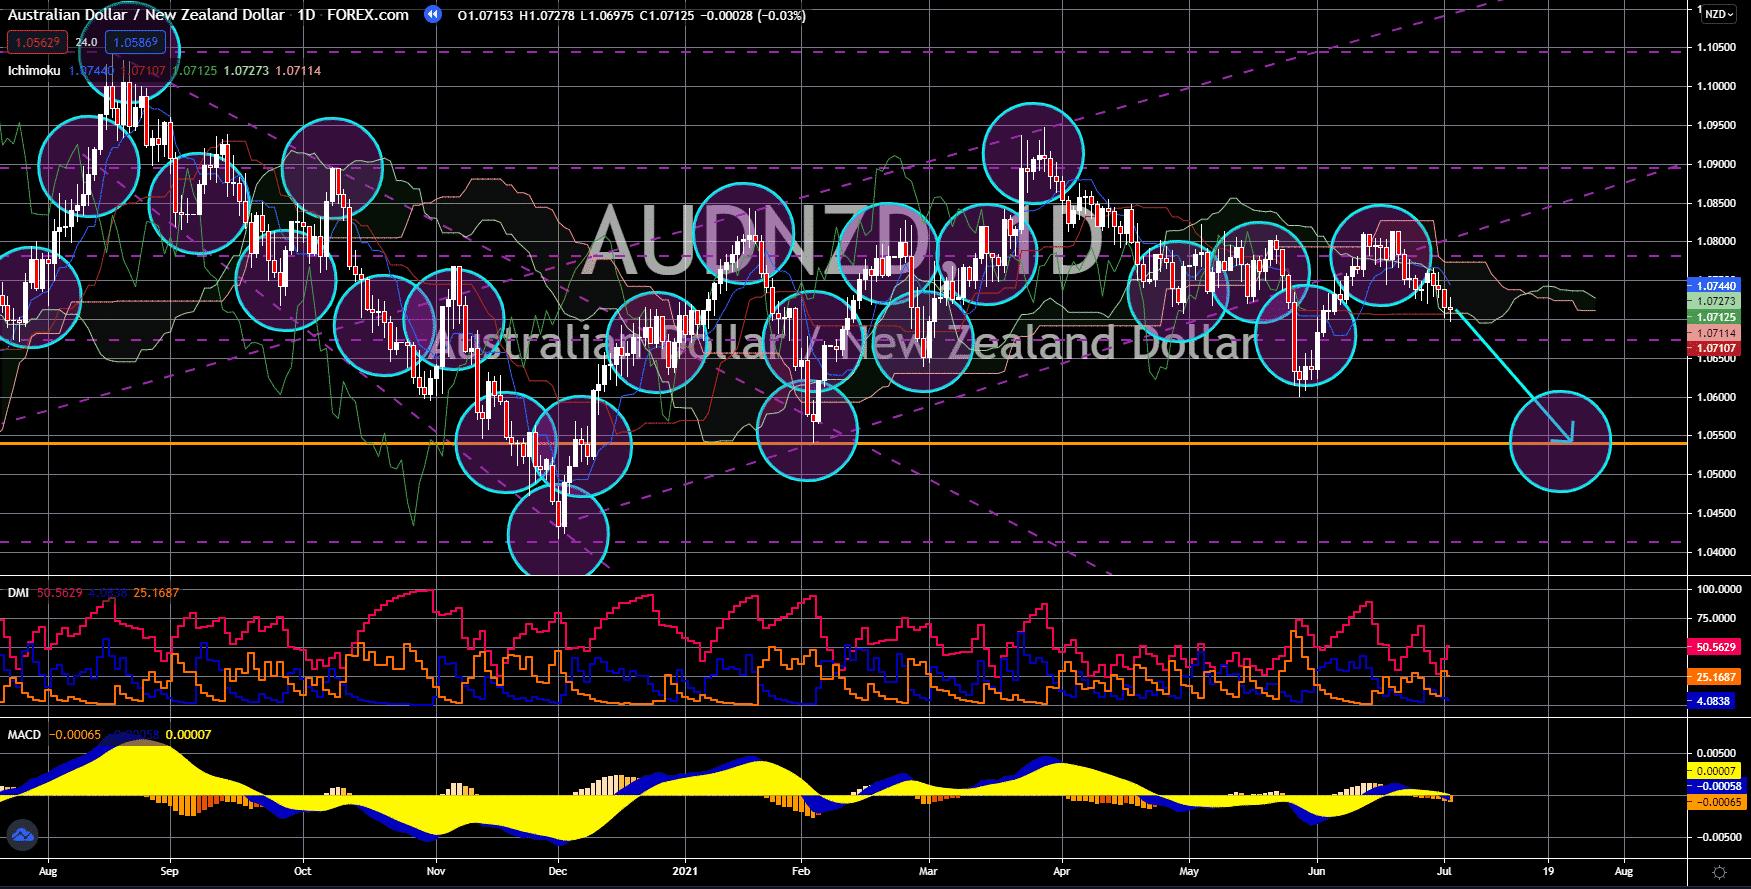 FinanceBrokerage - Market News: AUD/NZD Chart